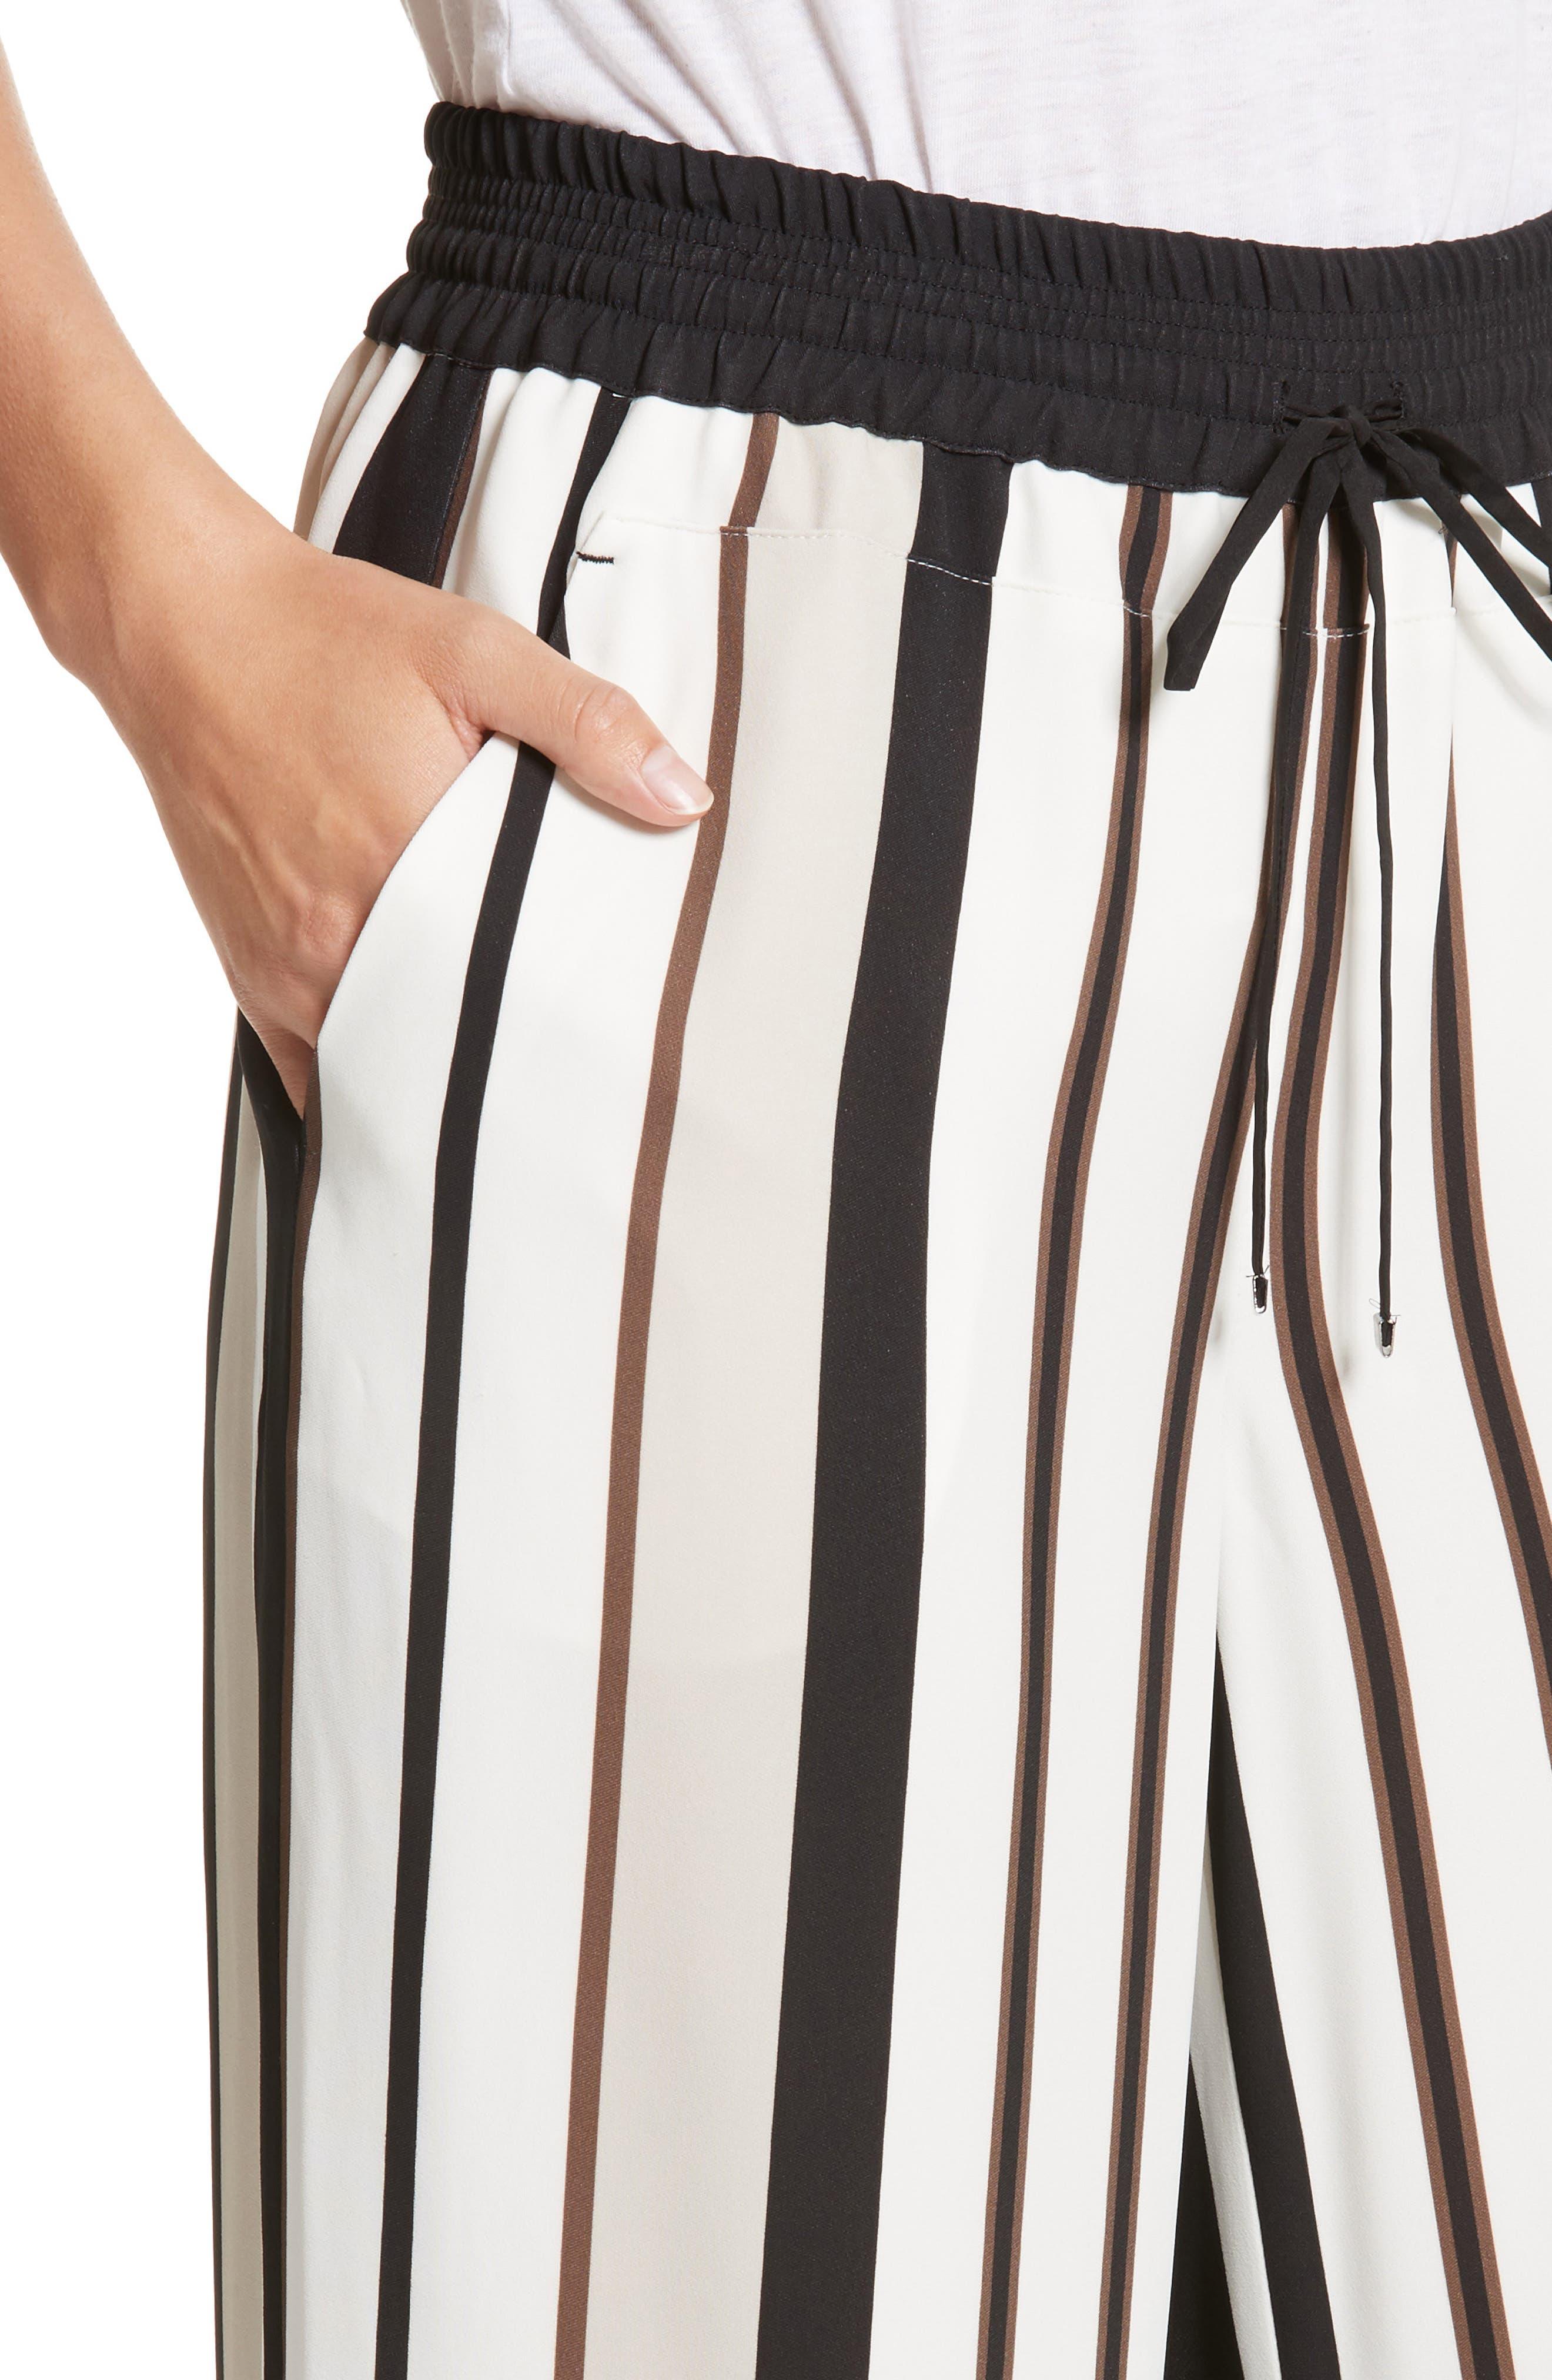 Allen Legacy Stripe Drape Cloth Pants,                             Alternate thumbnail 4, color,                             Black Multi